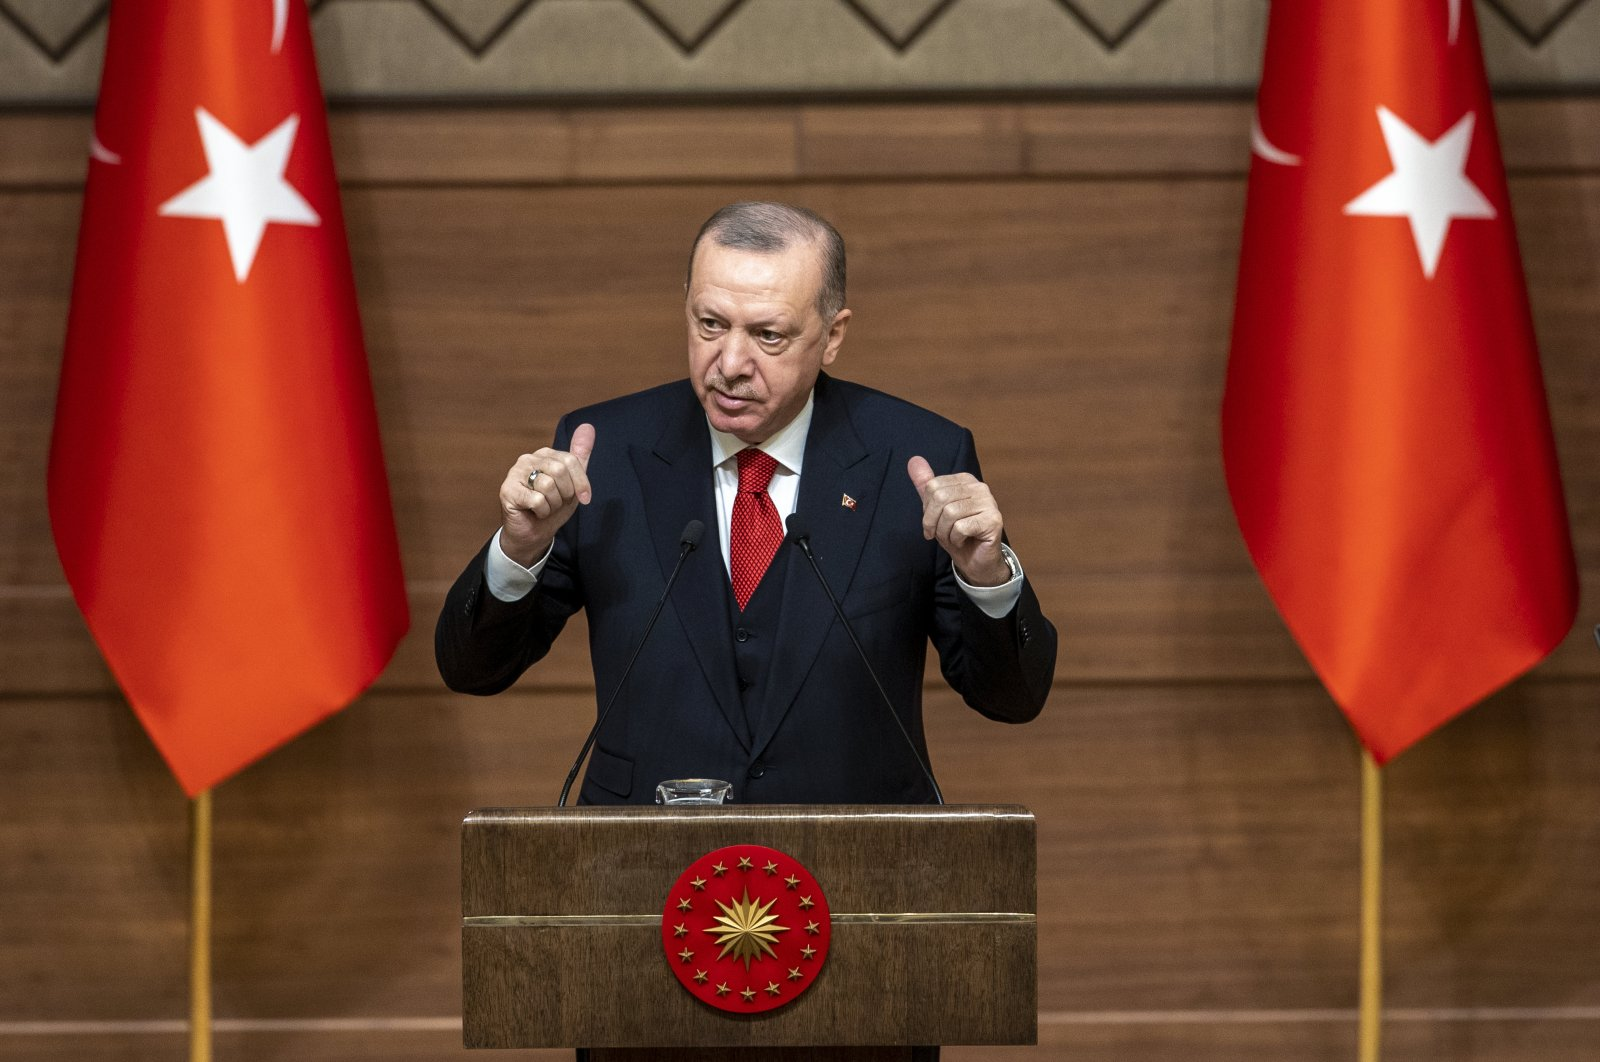 President Recep Tayyip Erdoğan speaks during Presidential Culture and Art Grand Awards ceremony held at Presidential Complex, Ankara, Turkey, Dec. 31, 2020. (AA Photo)